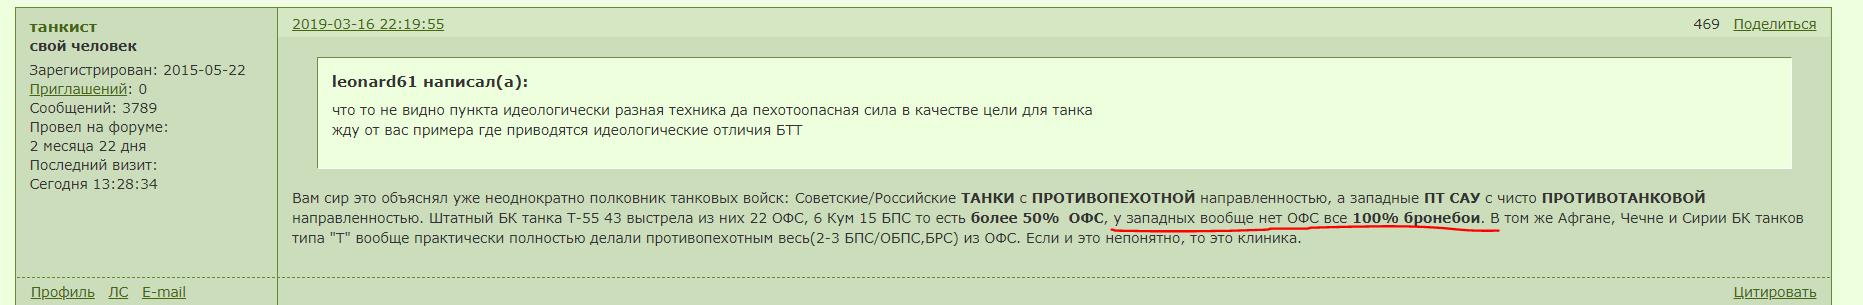 http://images.vfl.ru/ii/1553248416/79ab5f8f/25871646.png